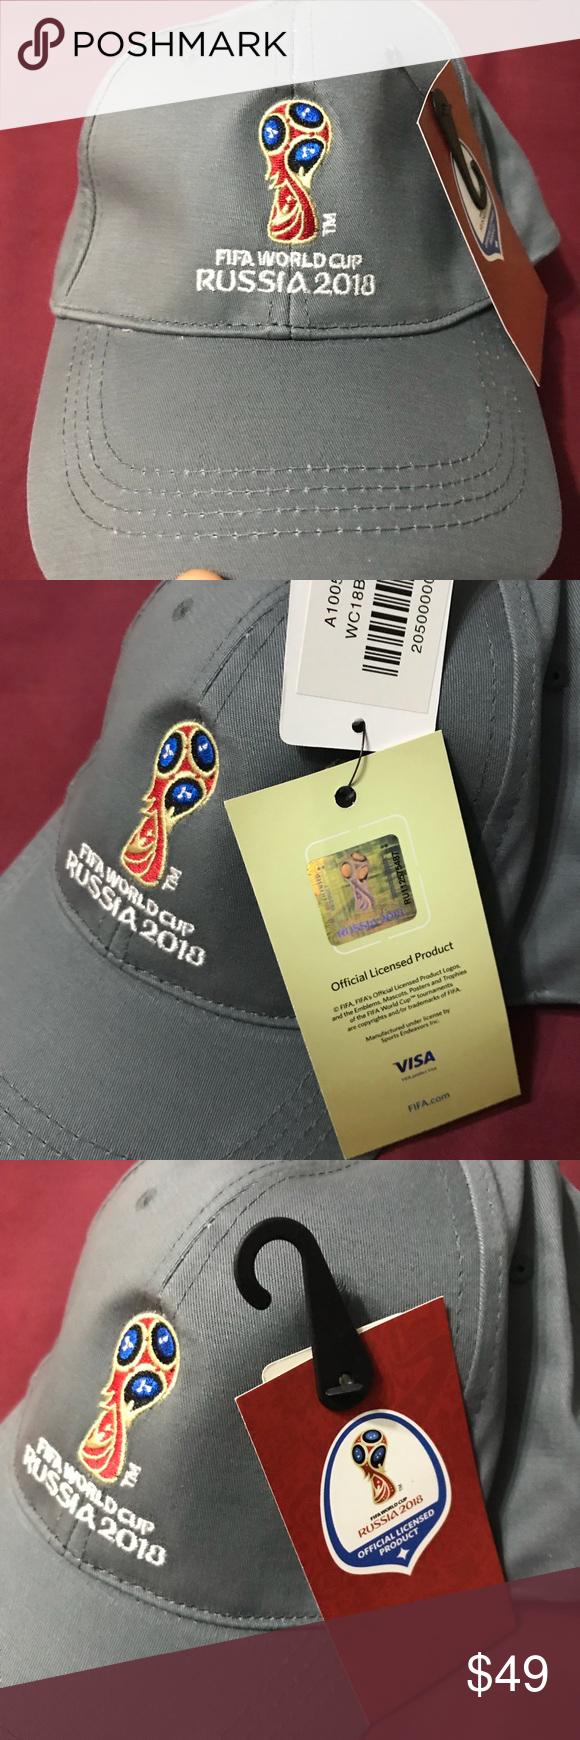 Amazing Cap World Cup 2018 - 4f6e113da592f52cd574ff2921671ef1  Gallery_469285 .png